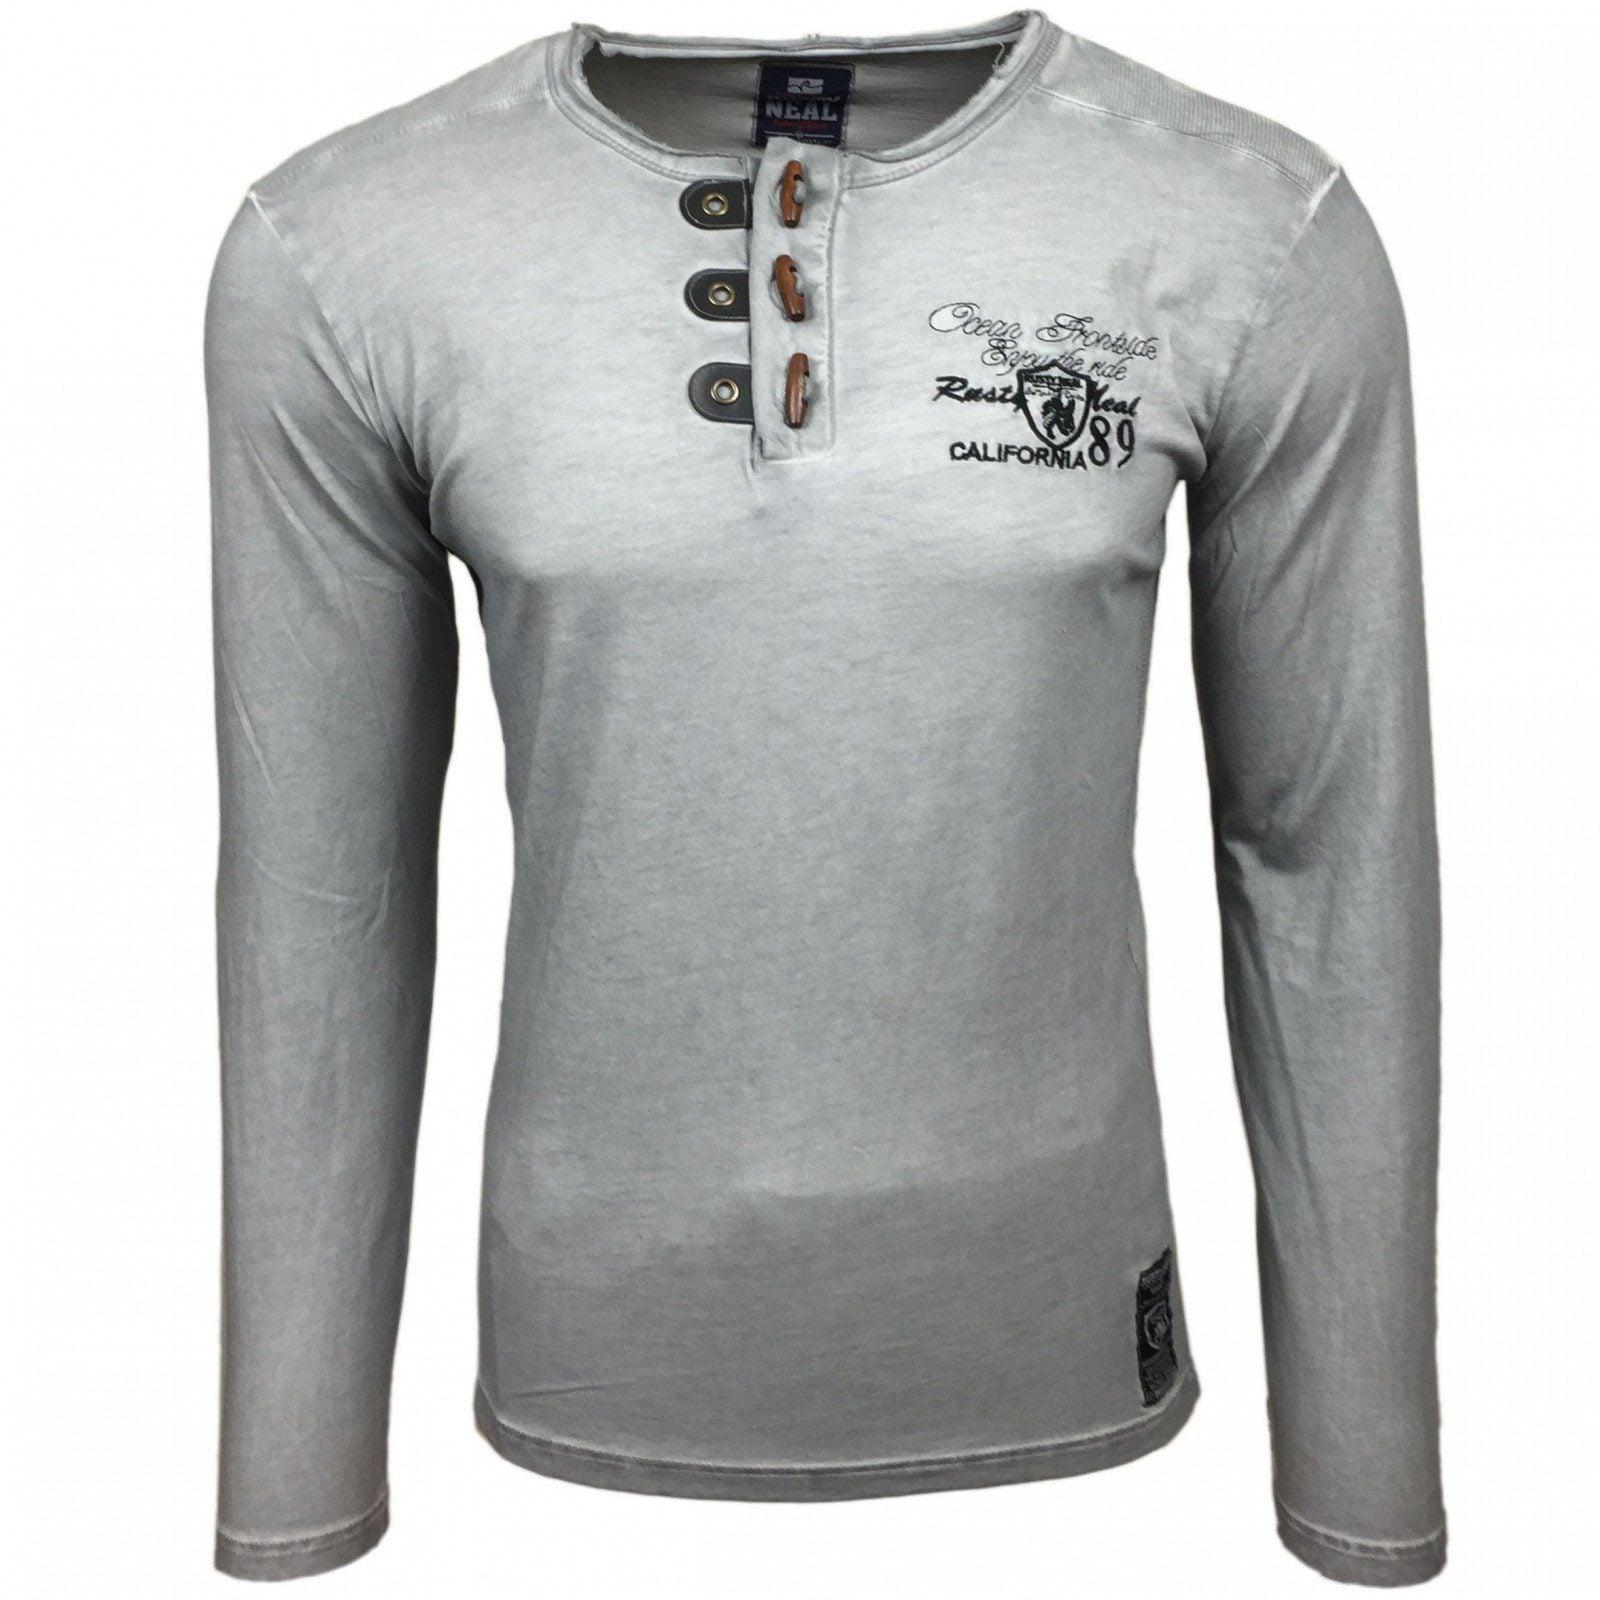 Rusty Neal Langarmshirt mit modischer Knopfleiste A1-RN10119 | Bekleidung > Shirts > Langarm Shirts | Grau | Baumwolle | Rusty Neal